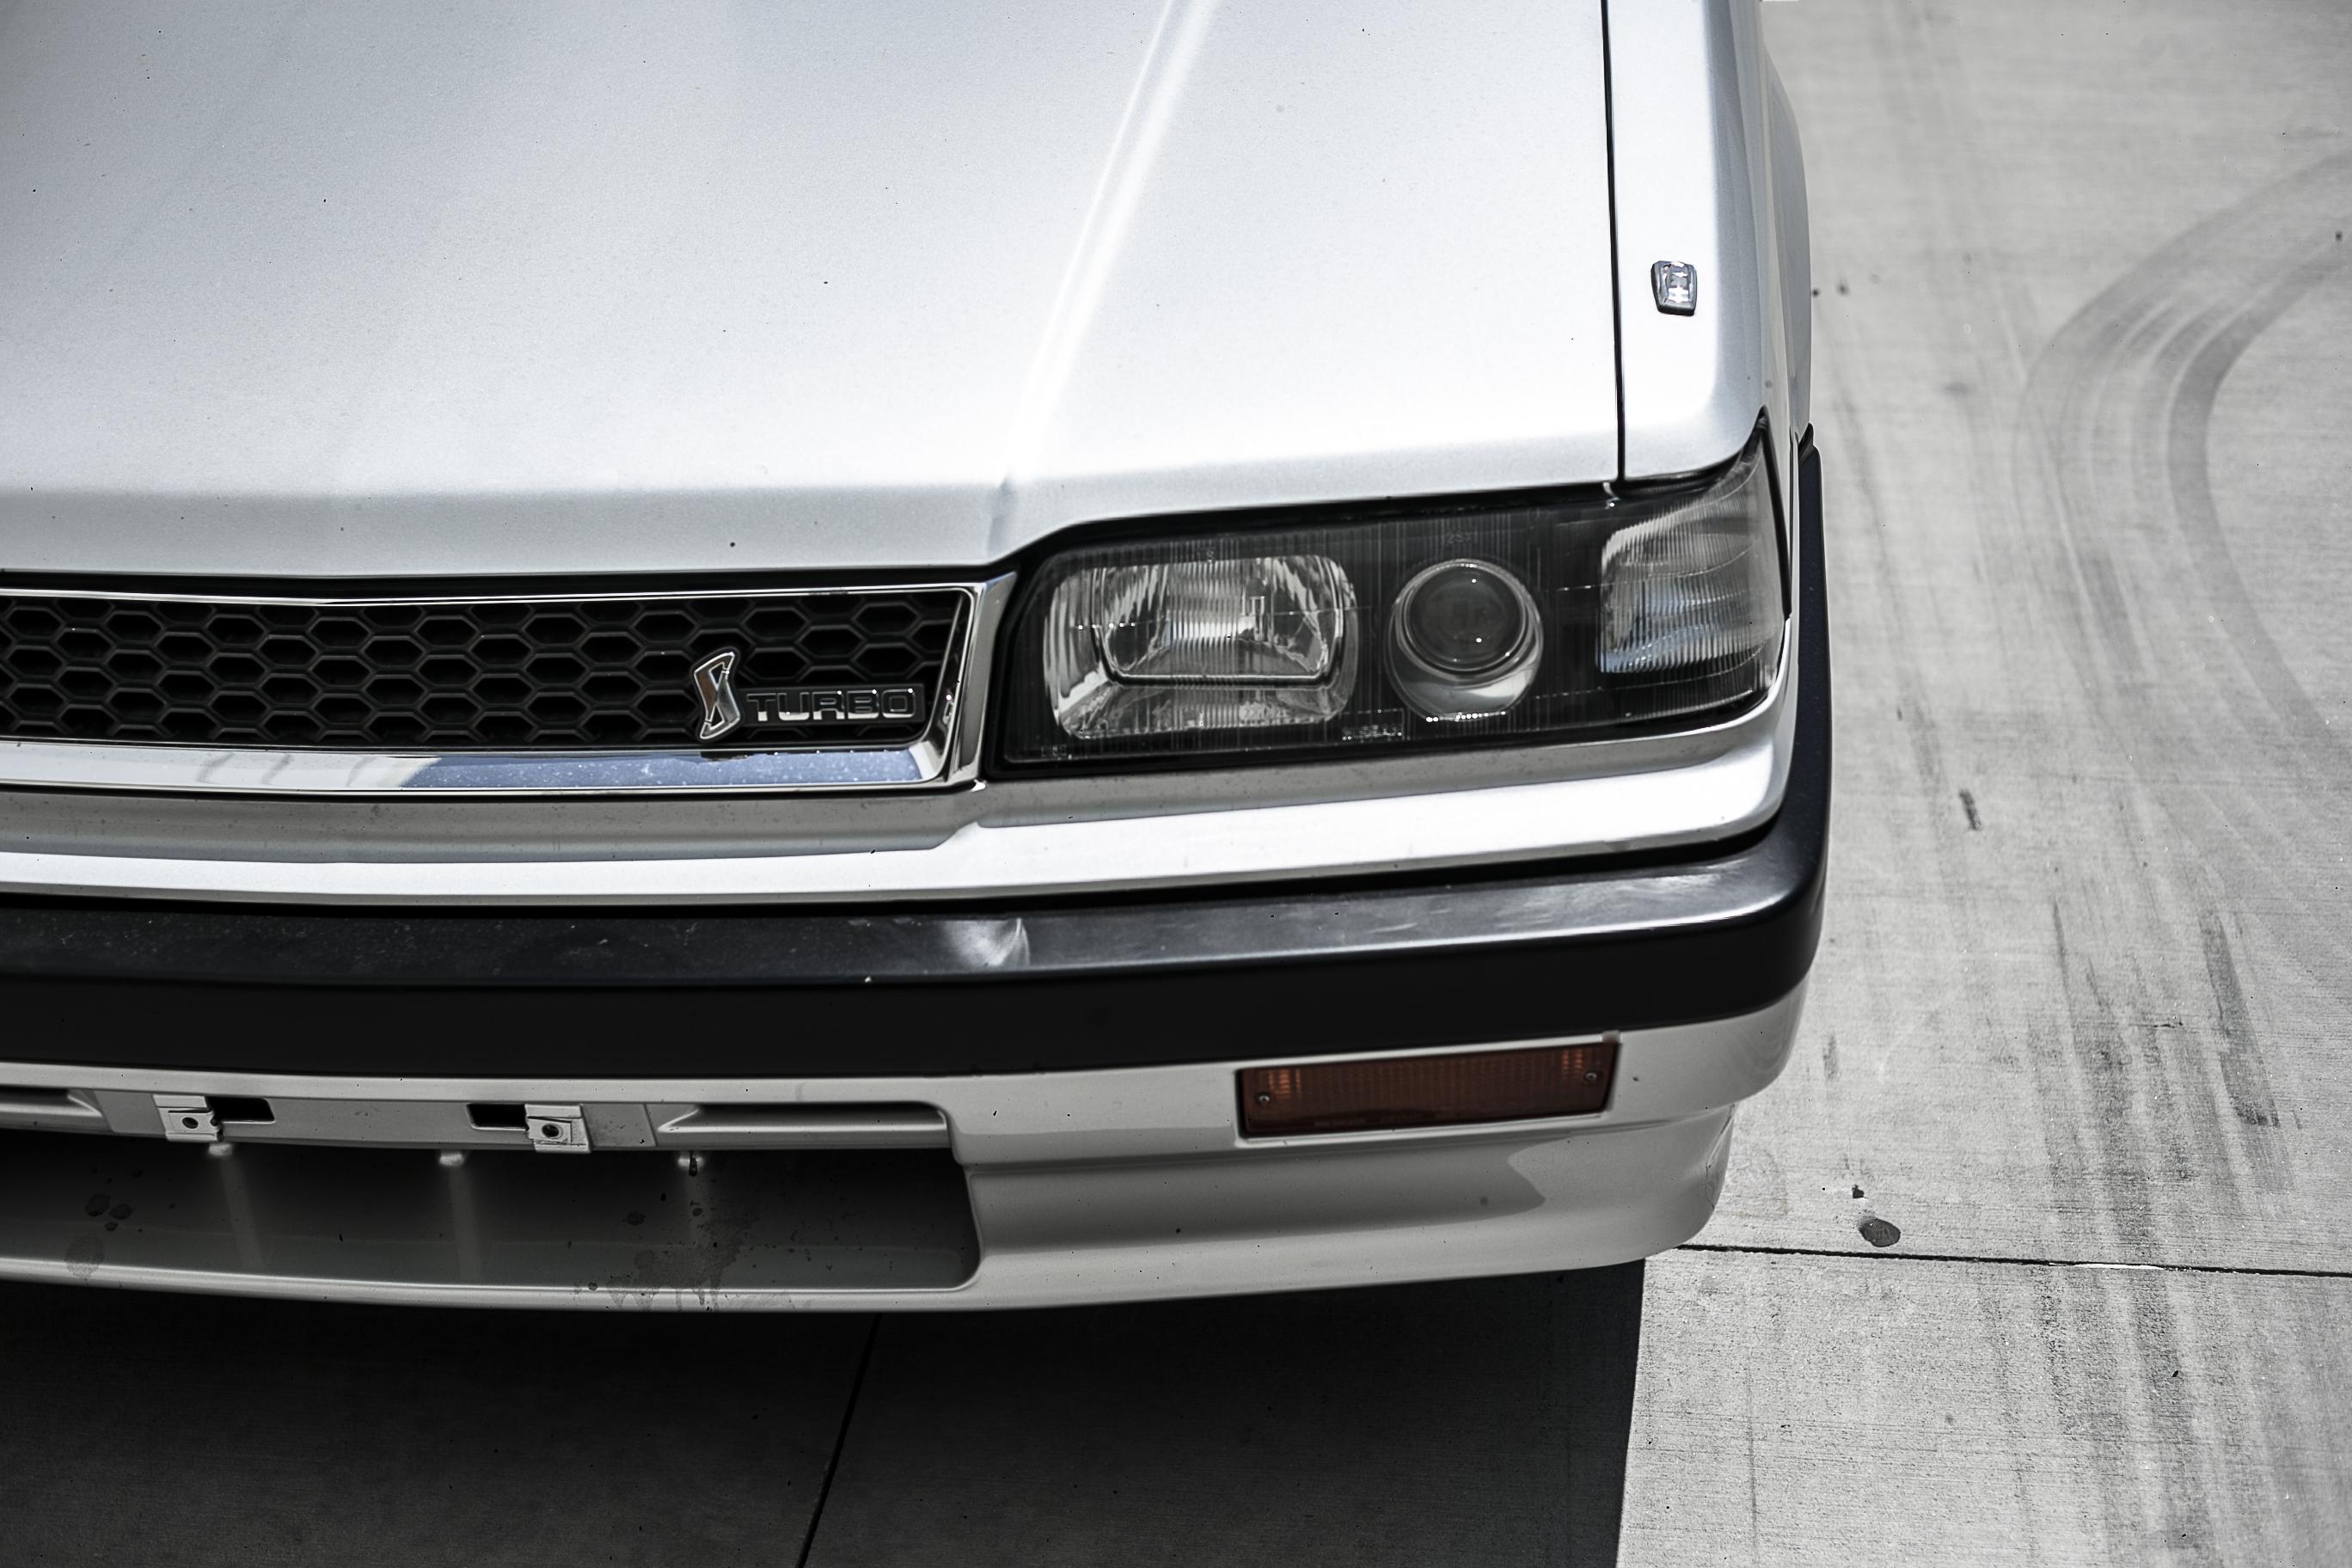 Nissan R31 Skyline turbo wagon headlight detail